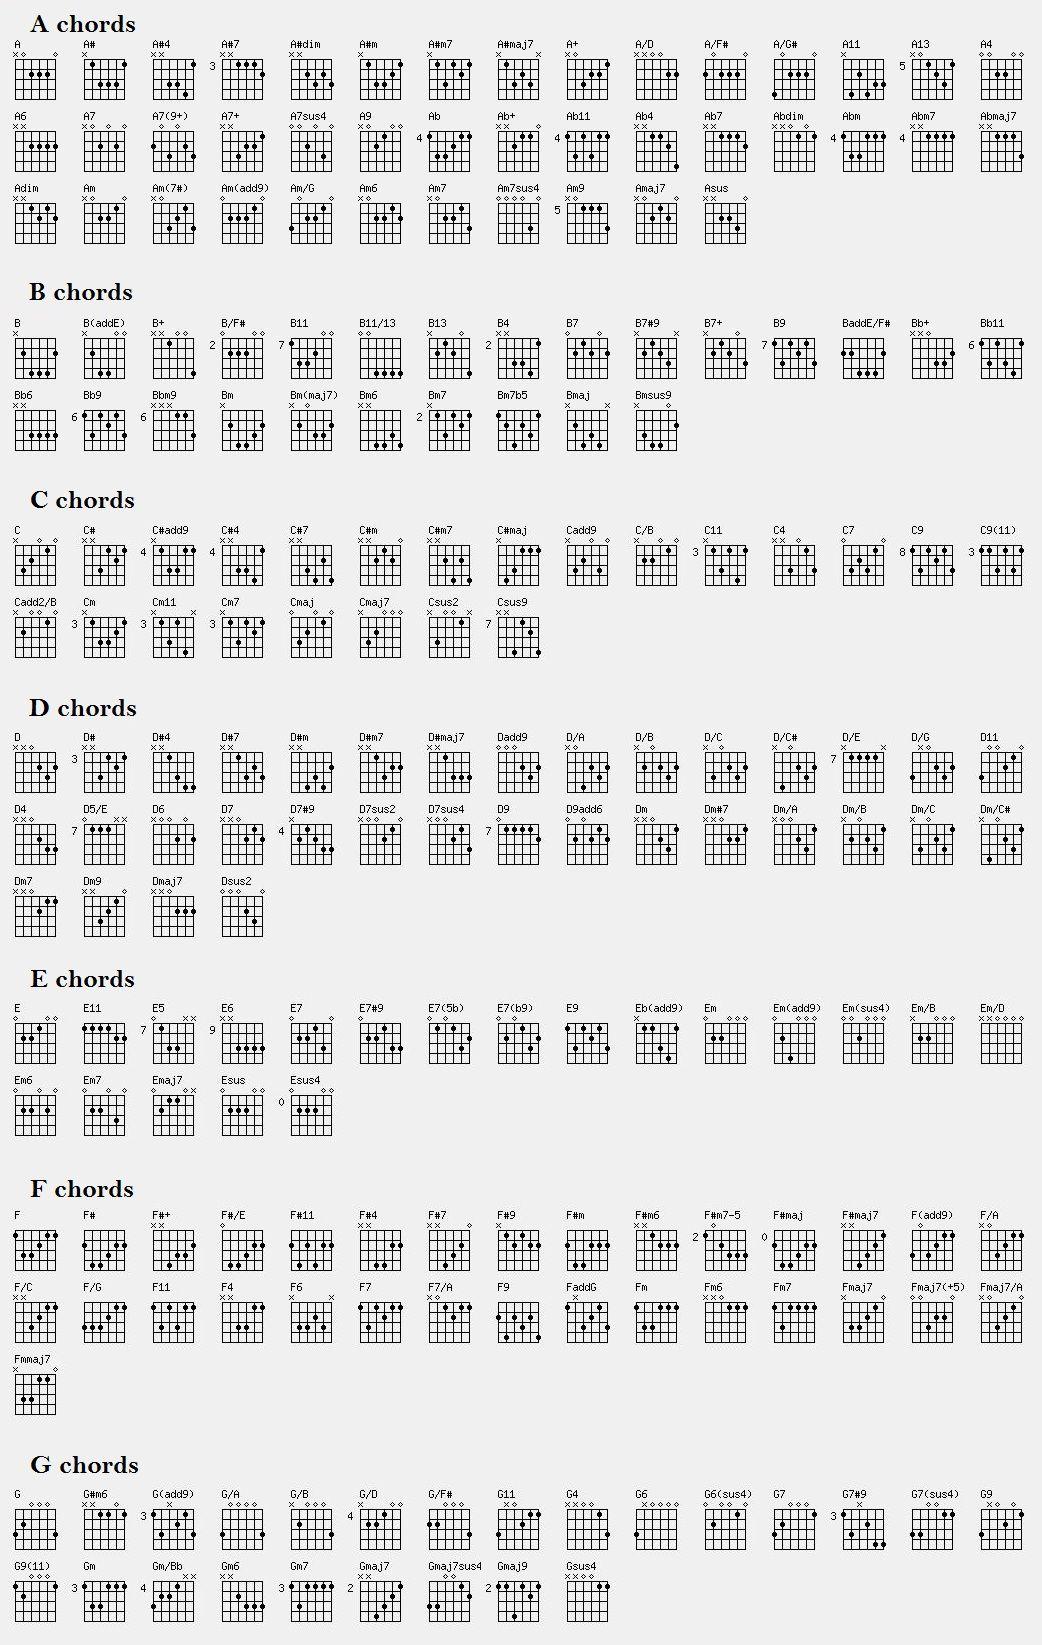 Free Printable Guitar Chord Chart | Guitar Chords Chart - Printable - Free Printable Song Lyrics With Guitar Chords